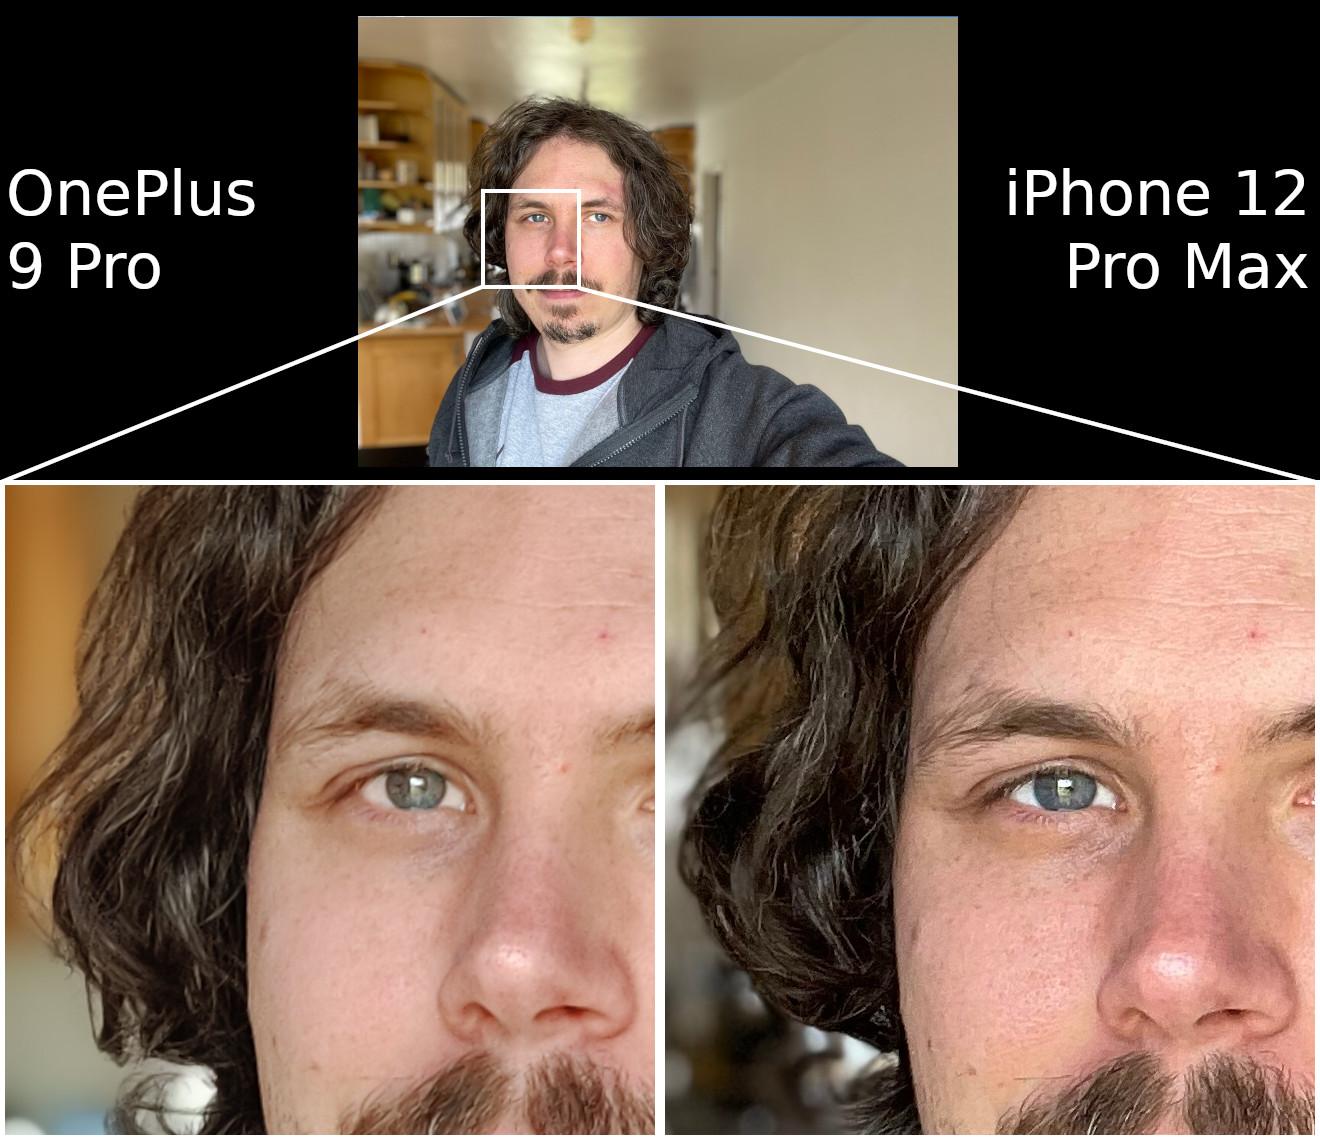 OnePlus 9 Pro vs iPhone 12 Pro Max selfie